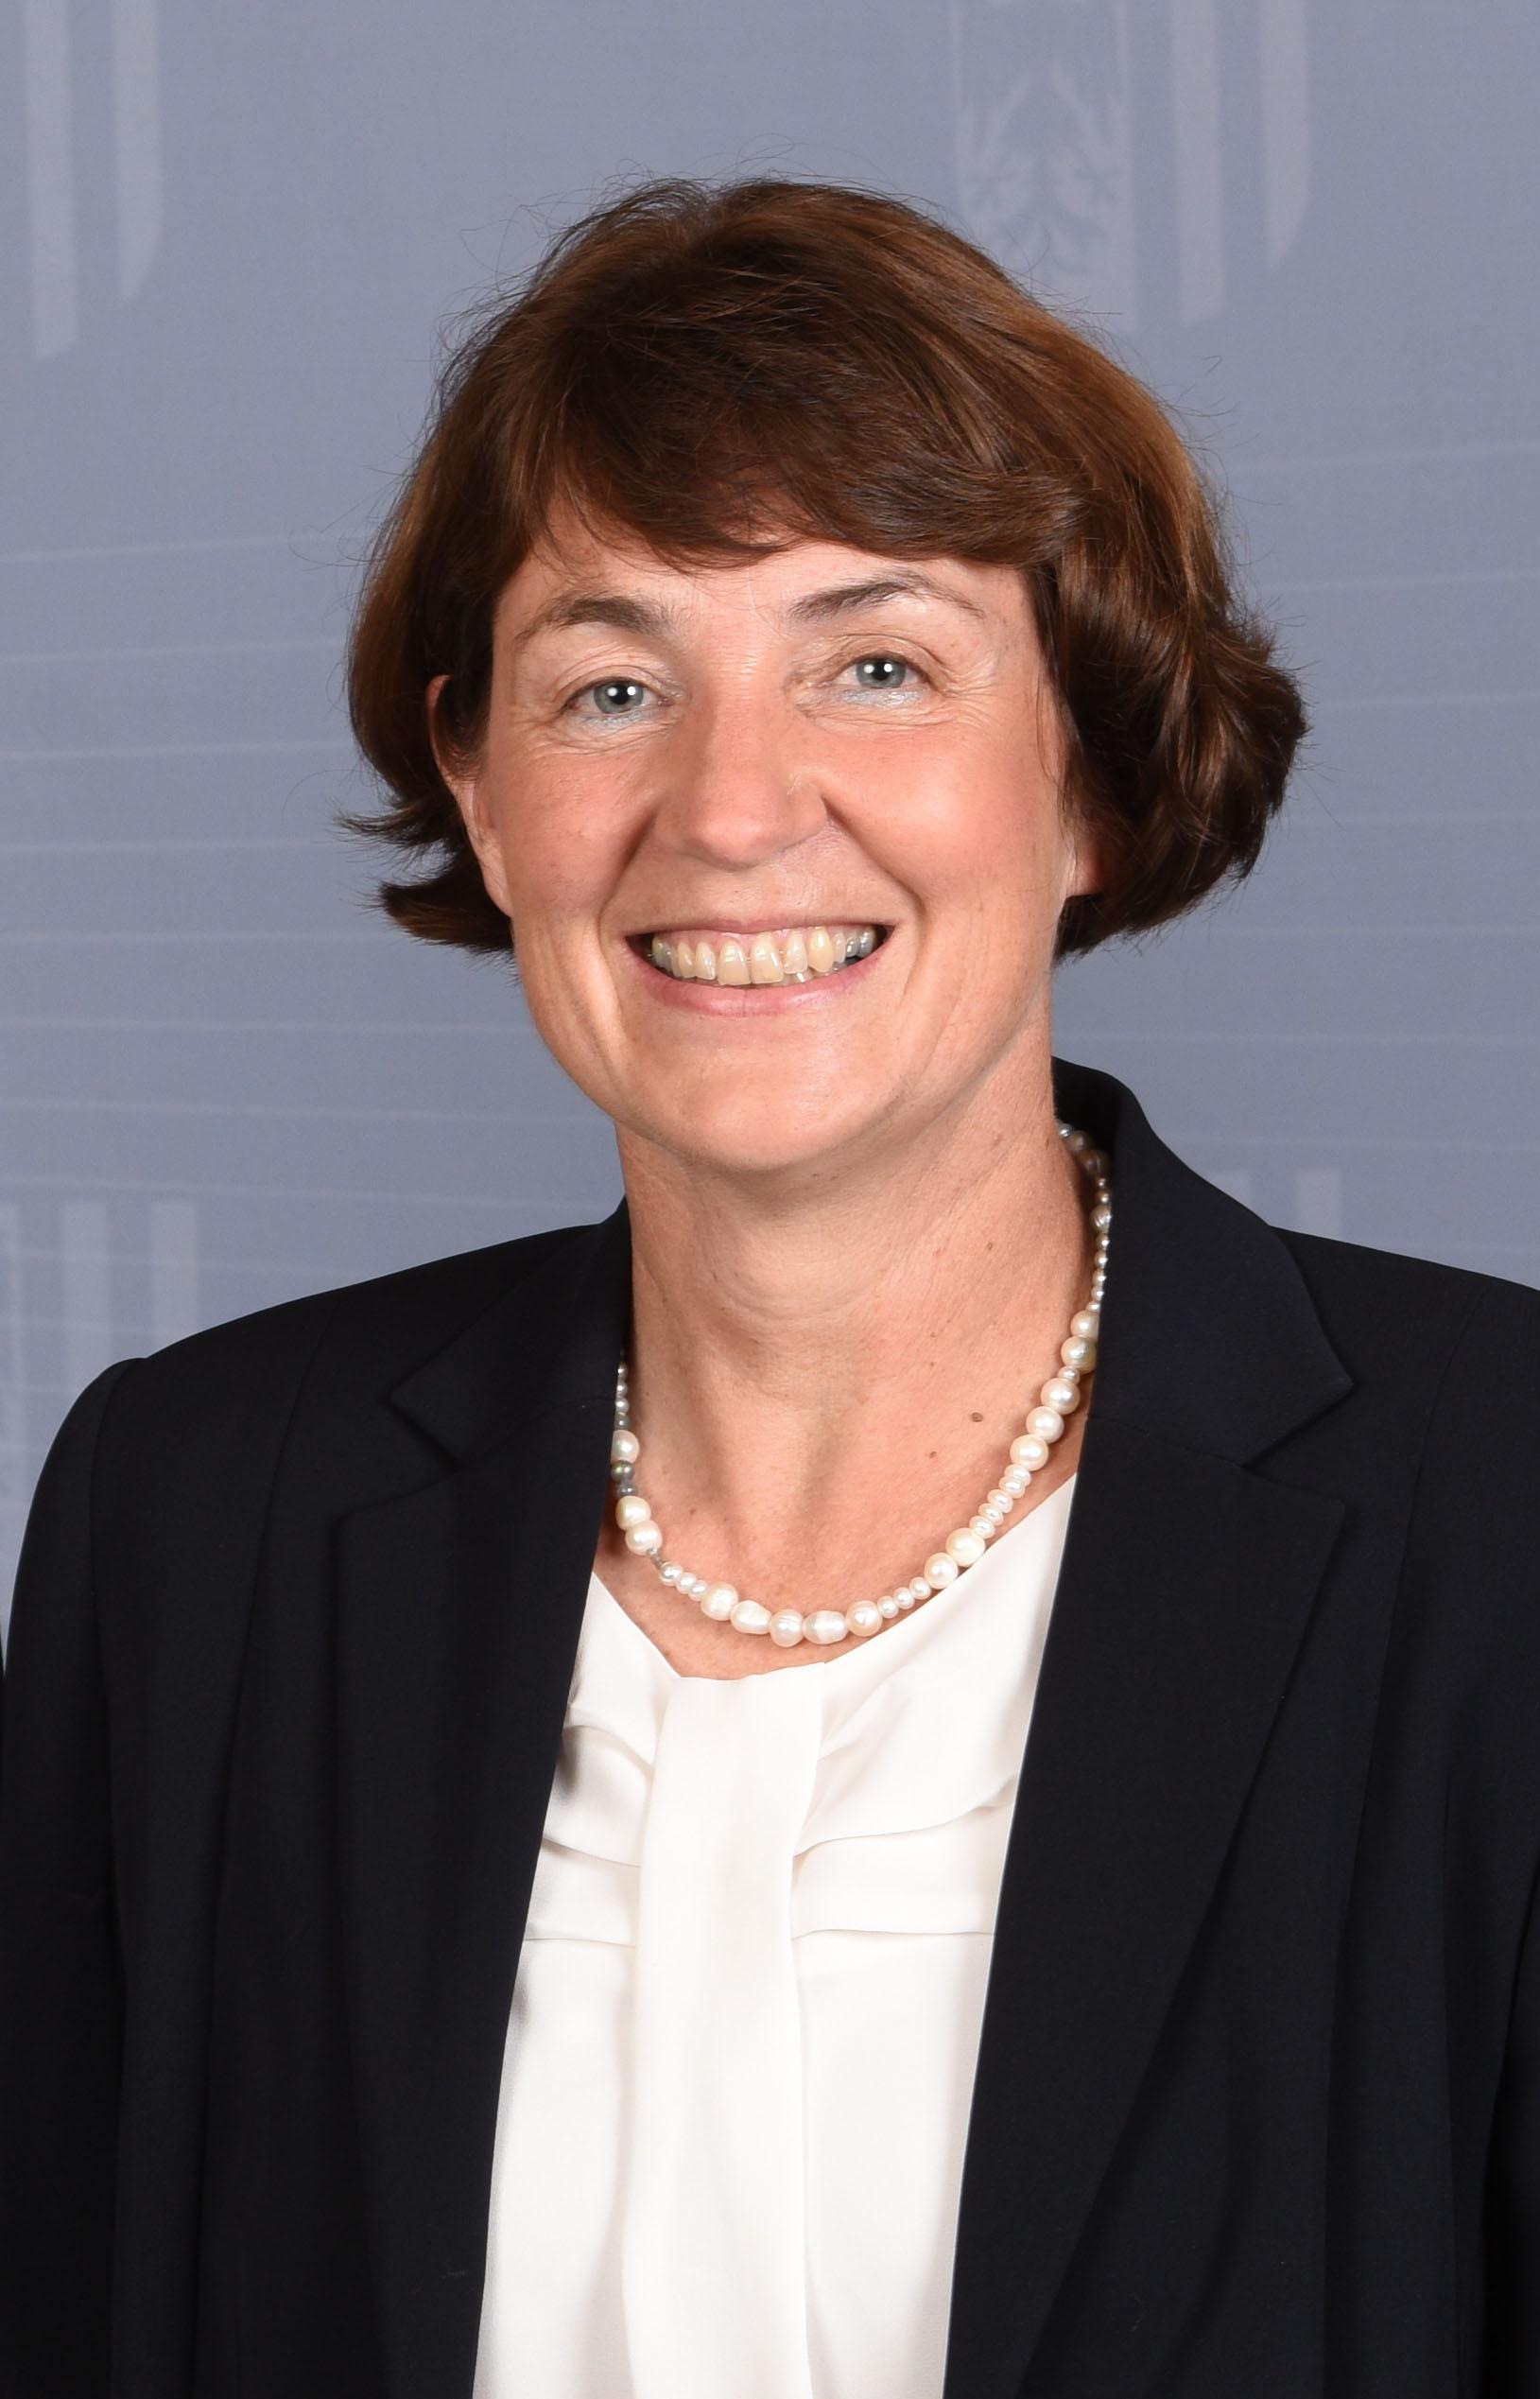 Tarsdorfer Bürgermeisterin Andrea Holzner wird neue Bundesrätin